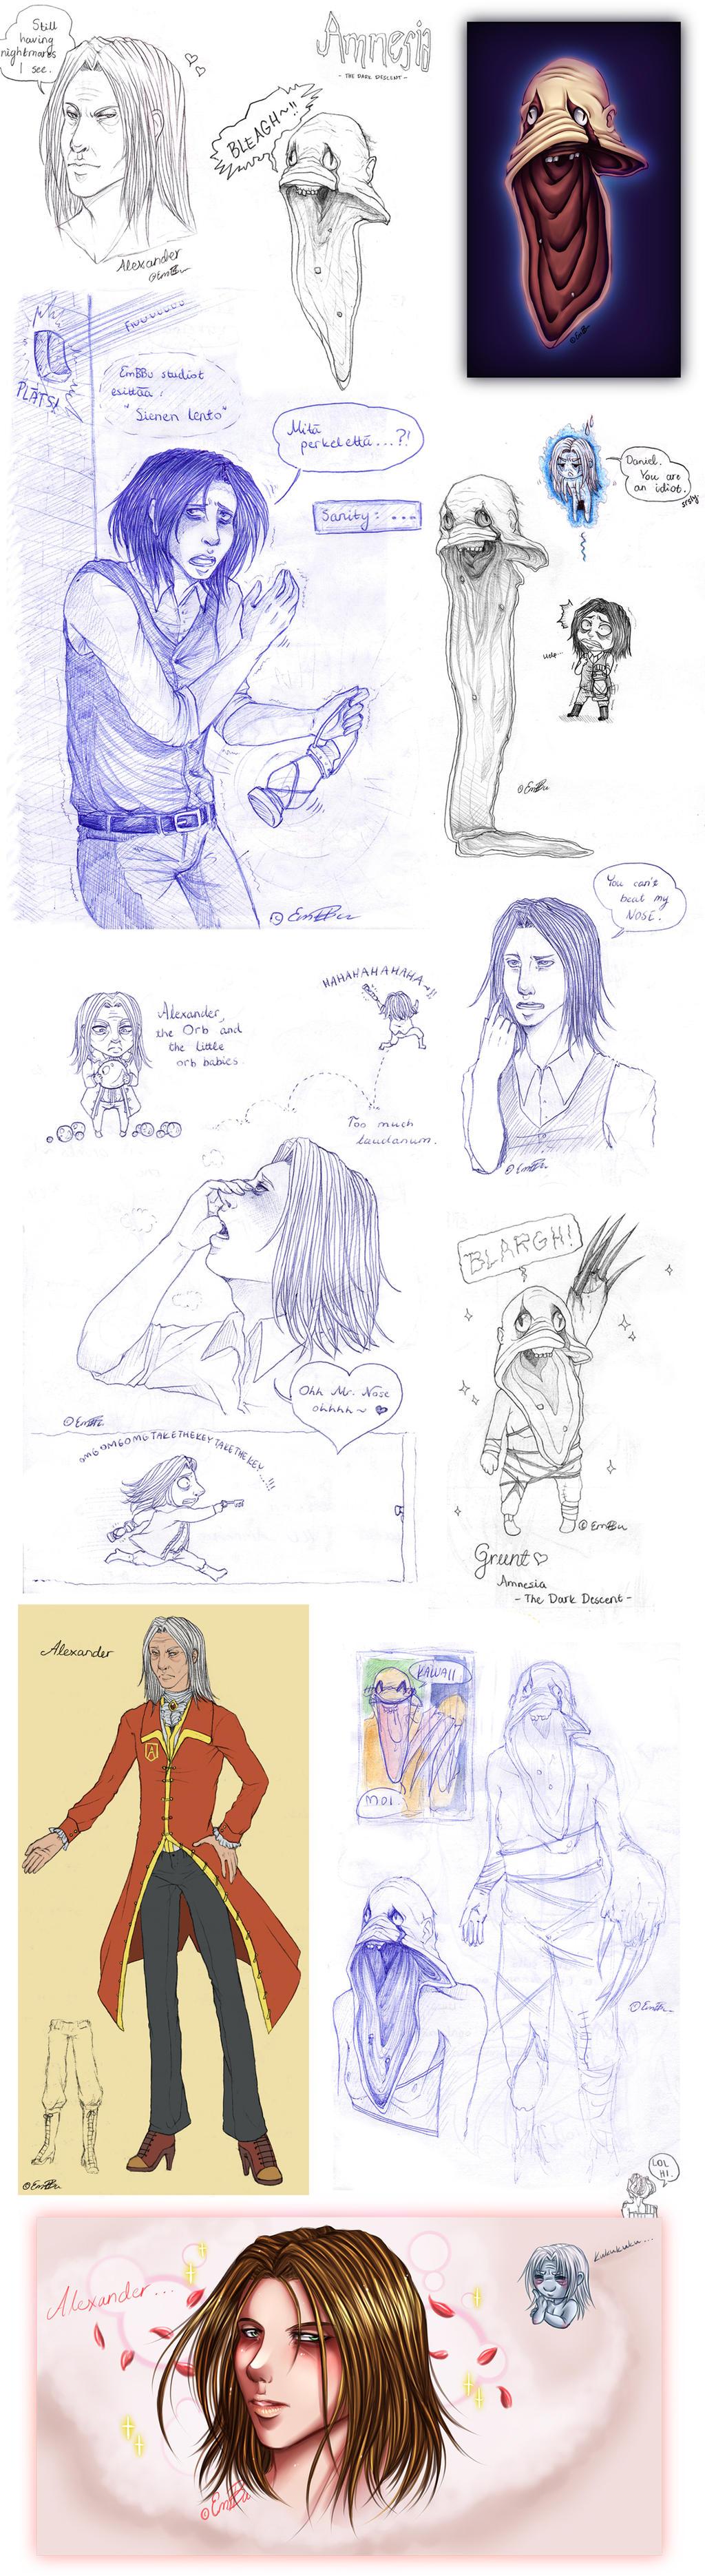 Amnesia sketchdump by EmBBu-chan